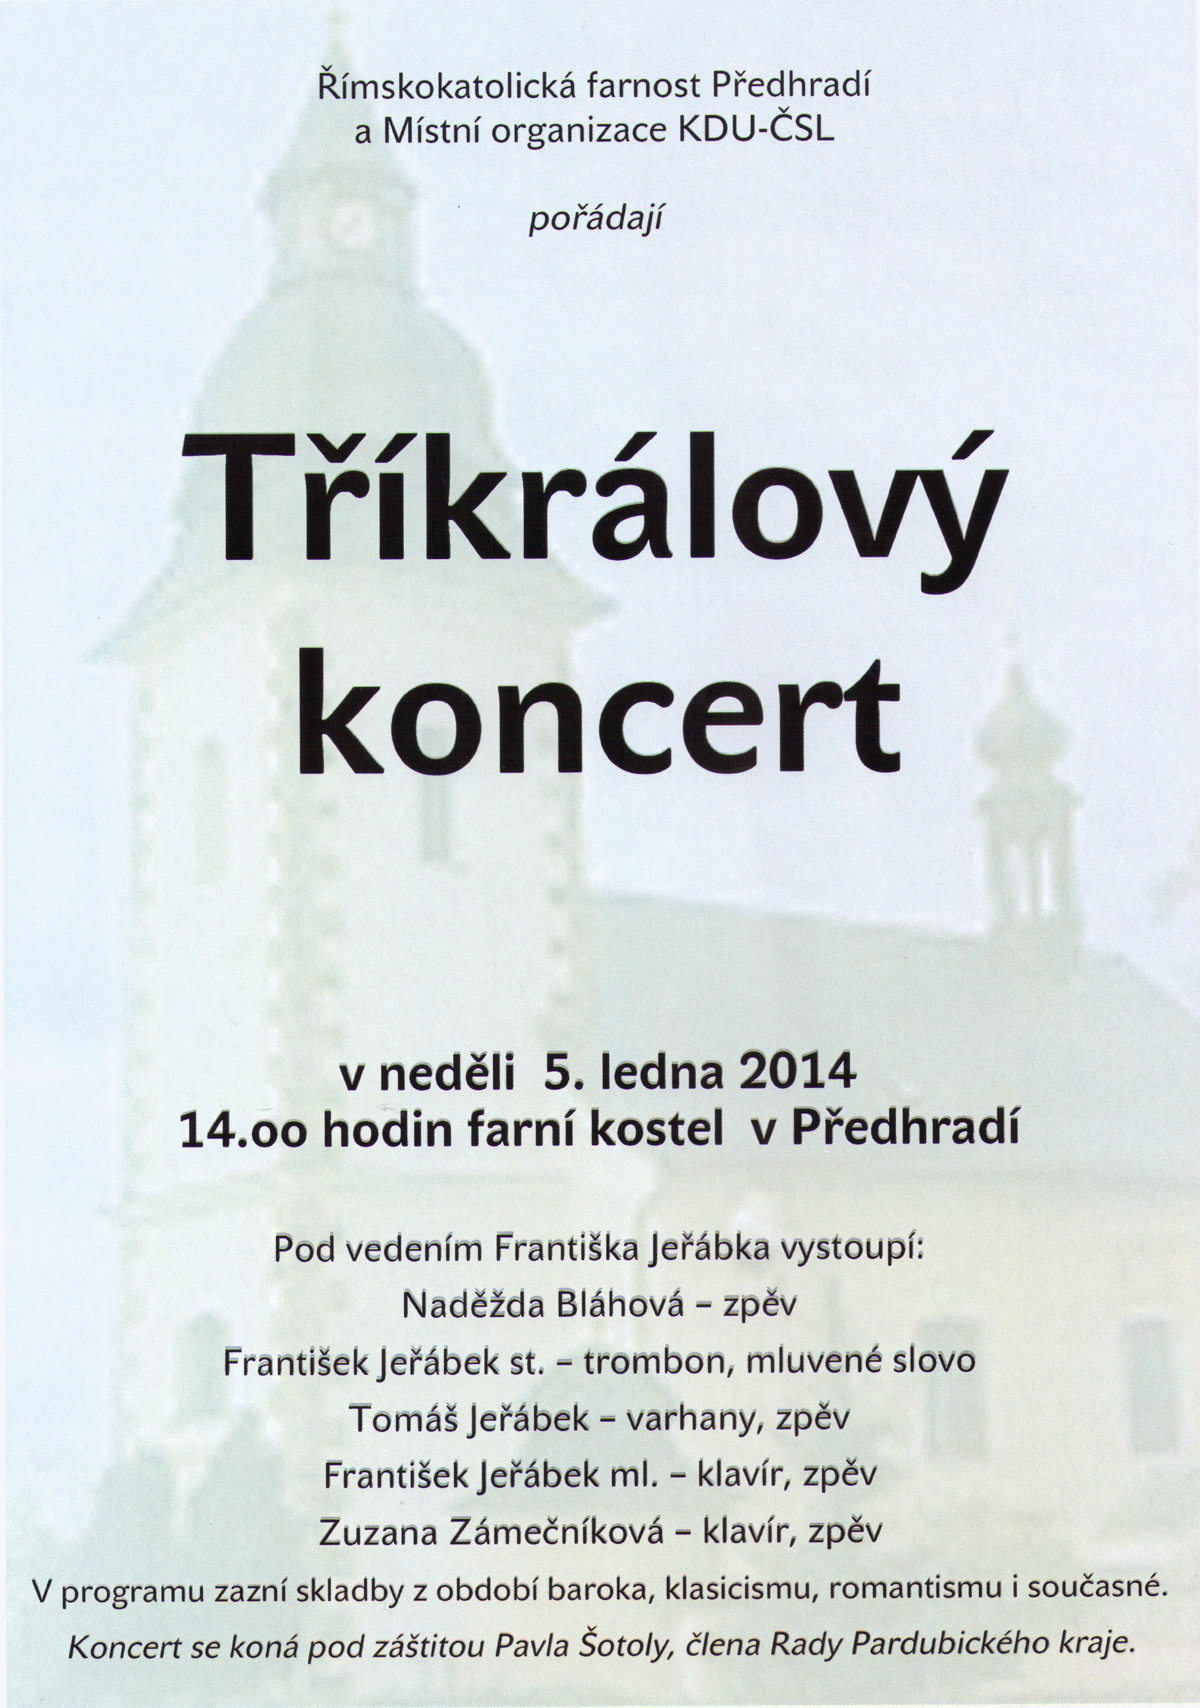 koncert_predhradi_2014_pozvanka